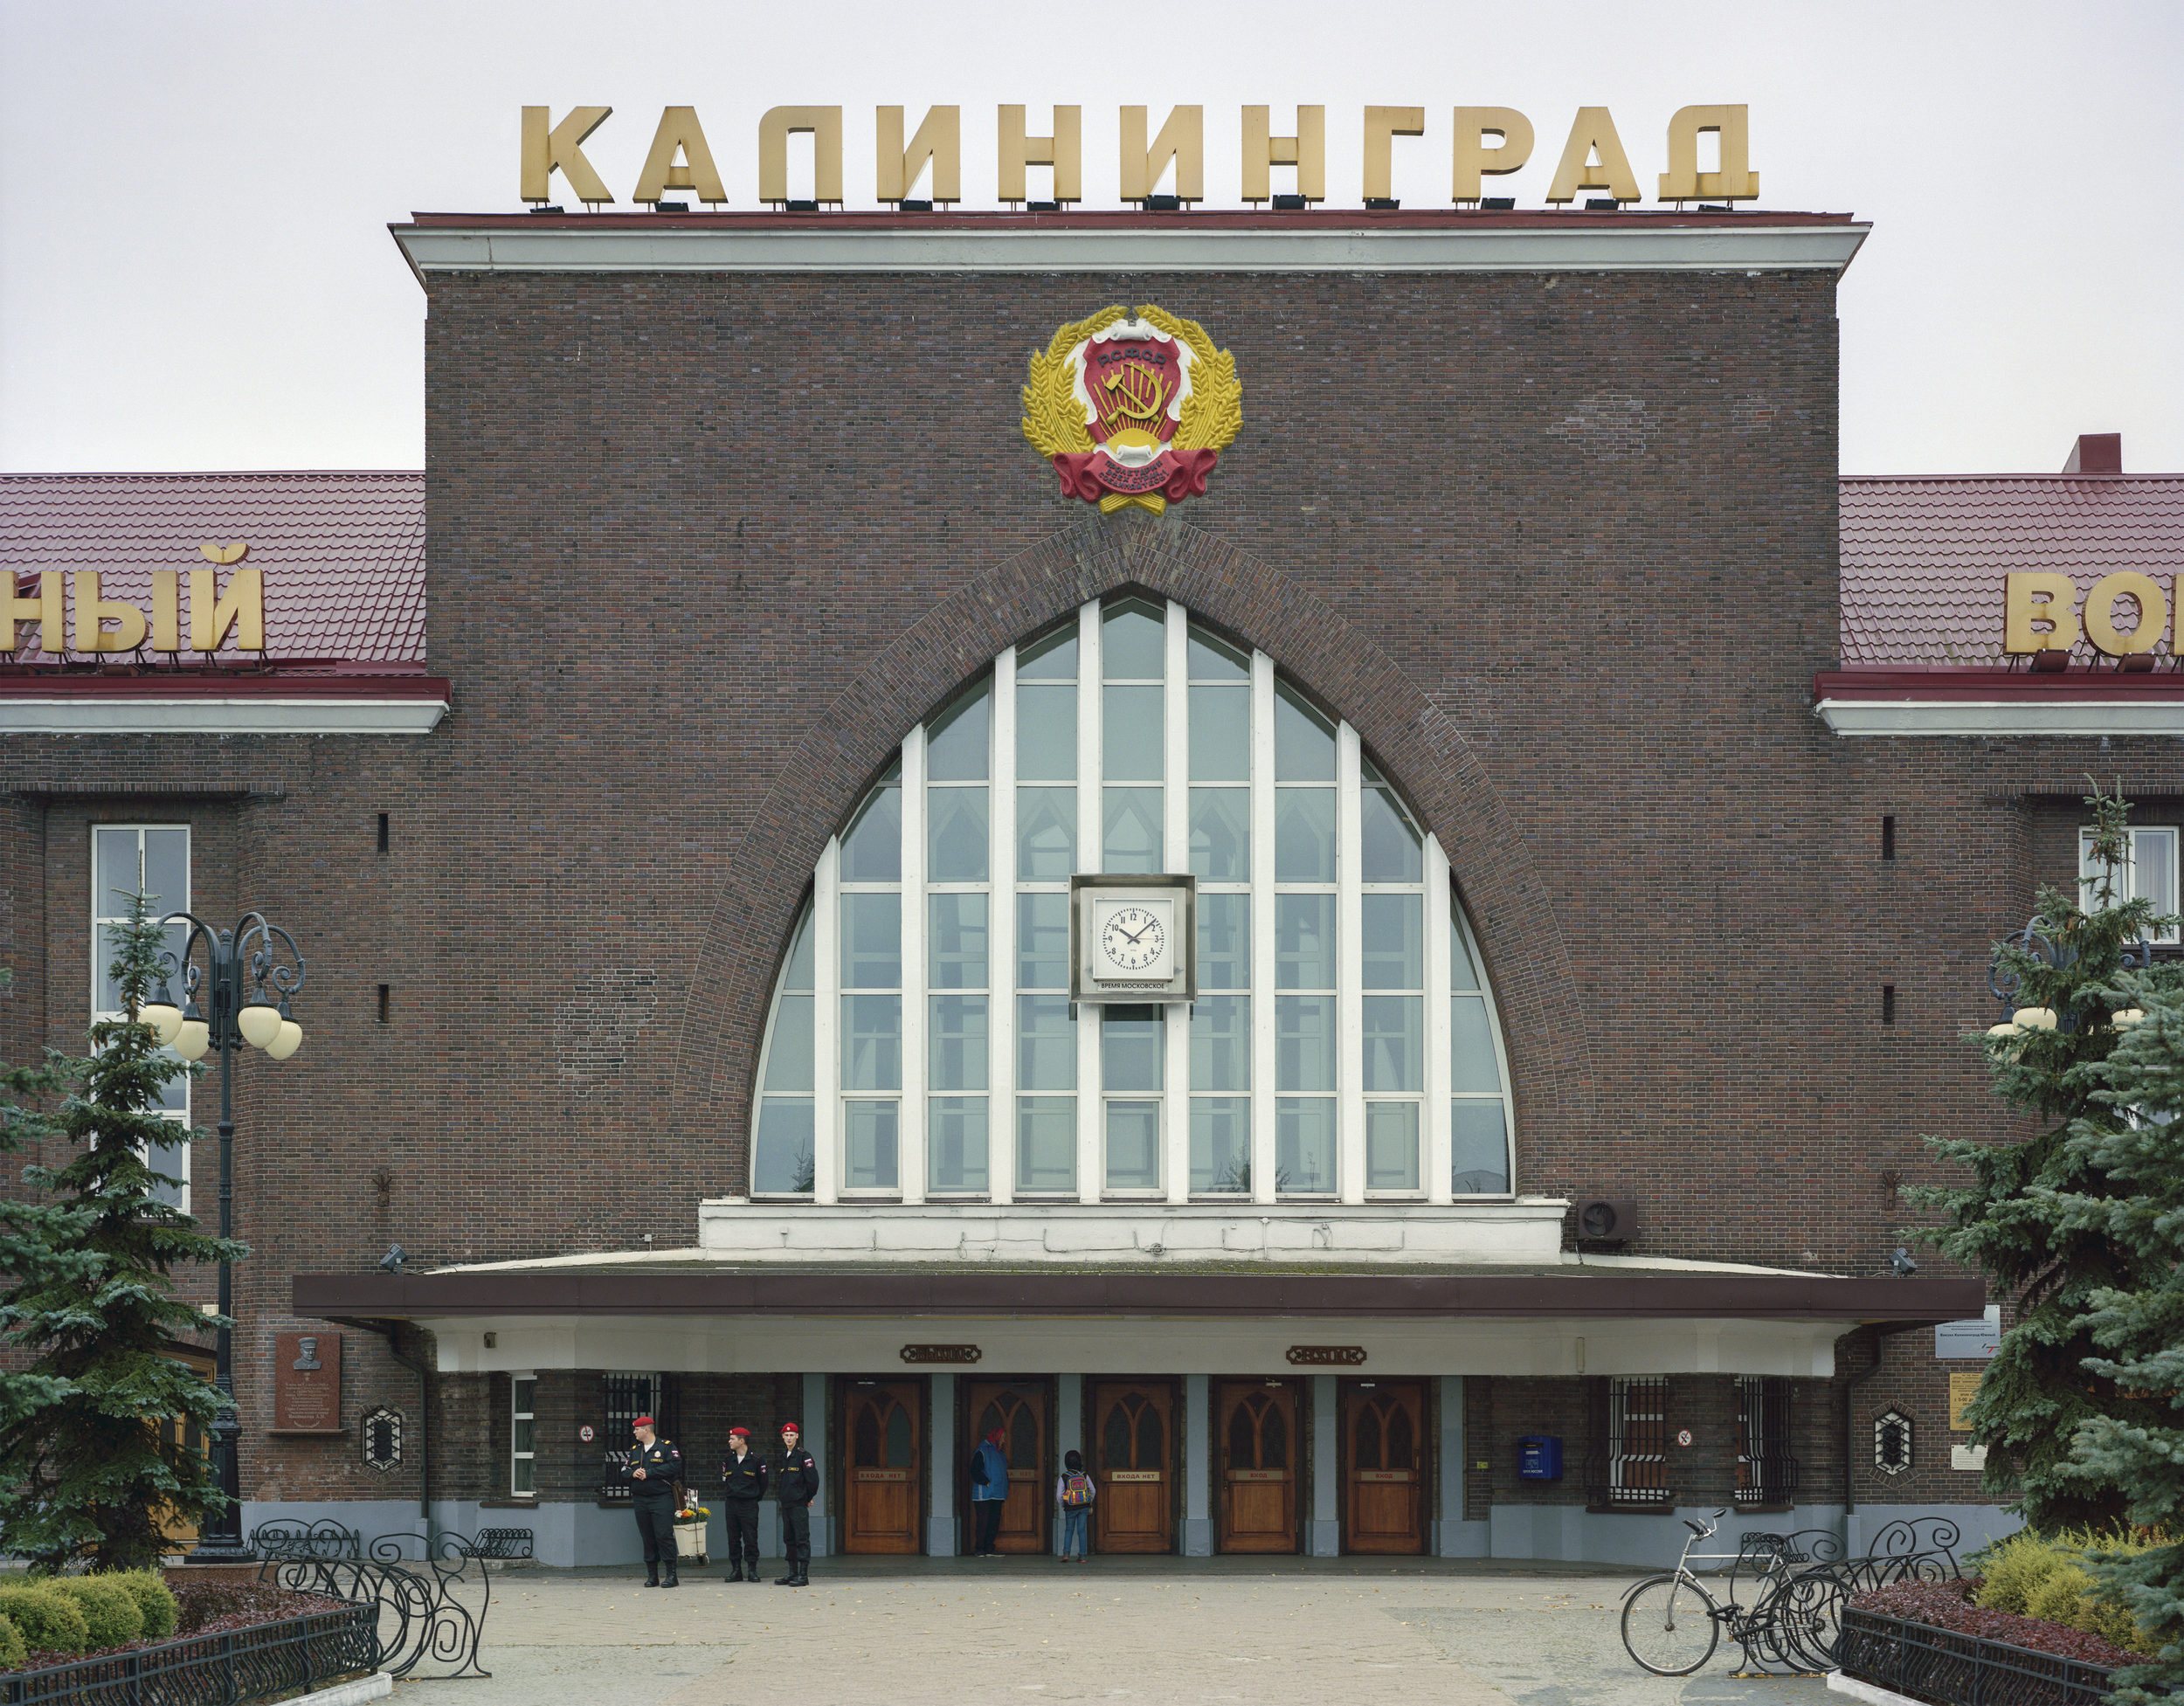 South railway station, Kaliningrad